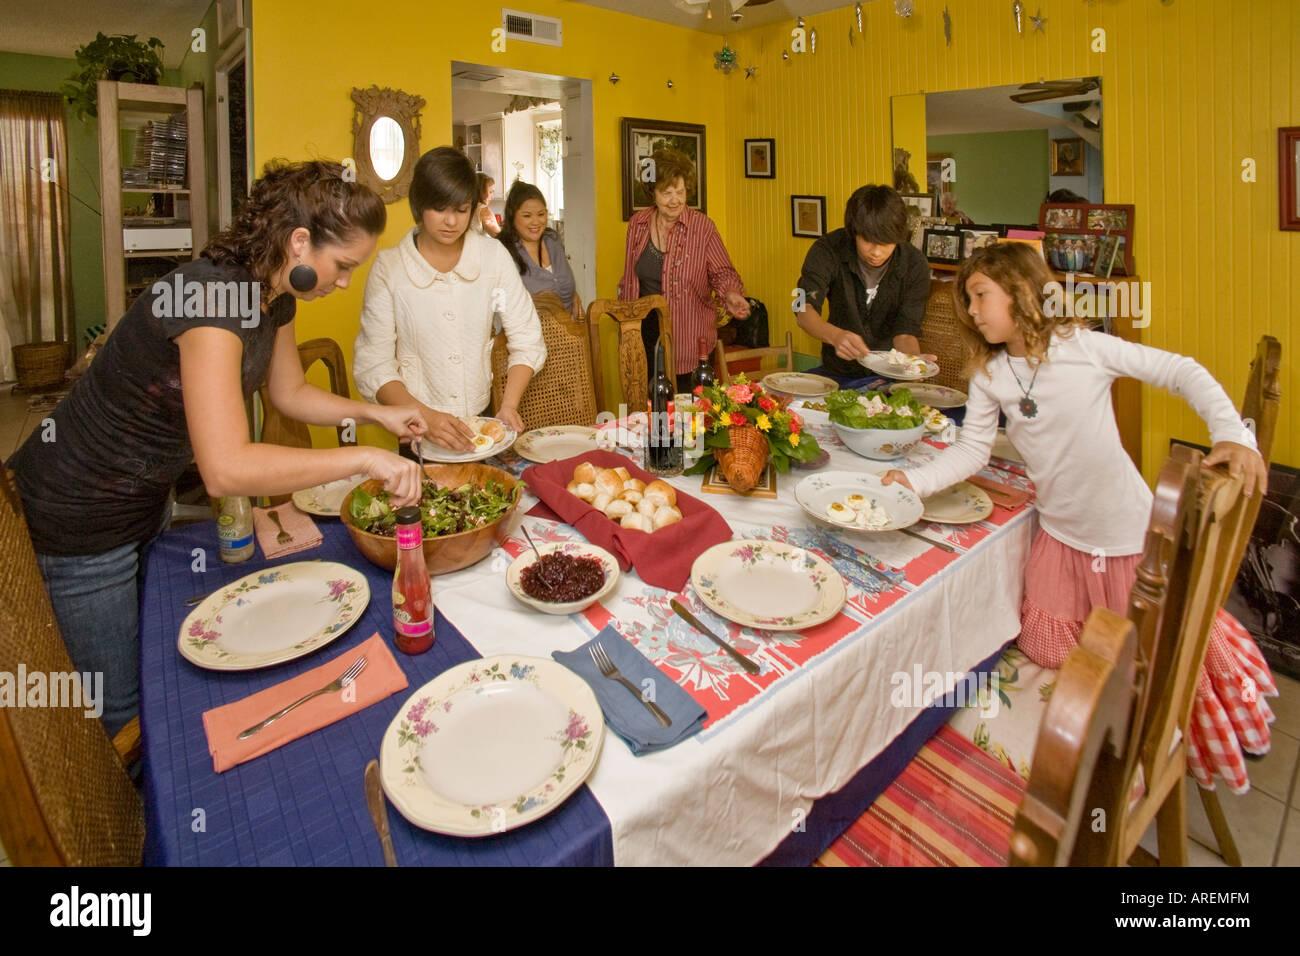 Members of an extended Hispasnic Caucasian family prepare the dining table before Thanksgiving dinner in California - Stock Image